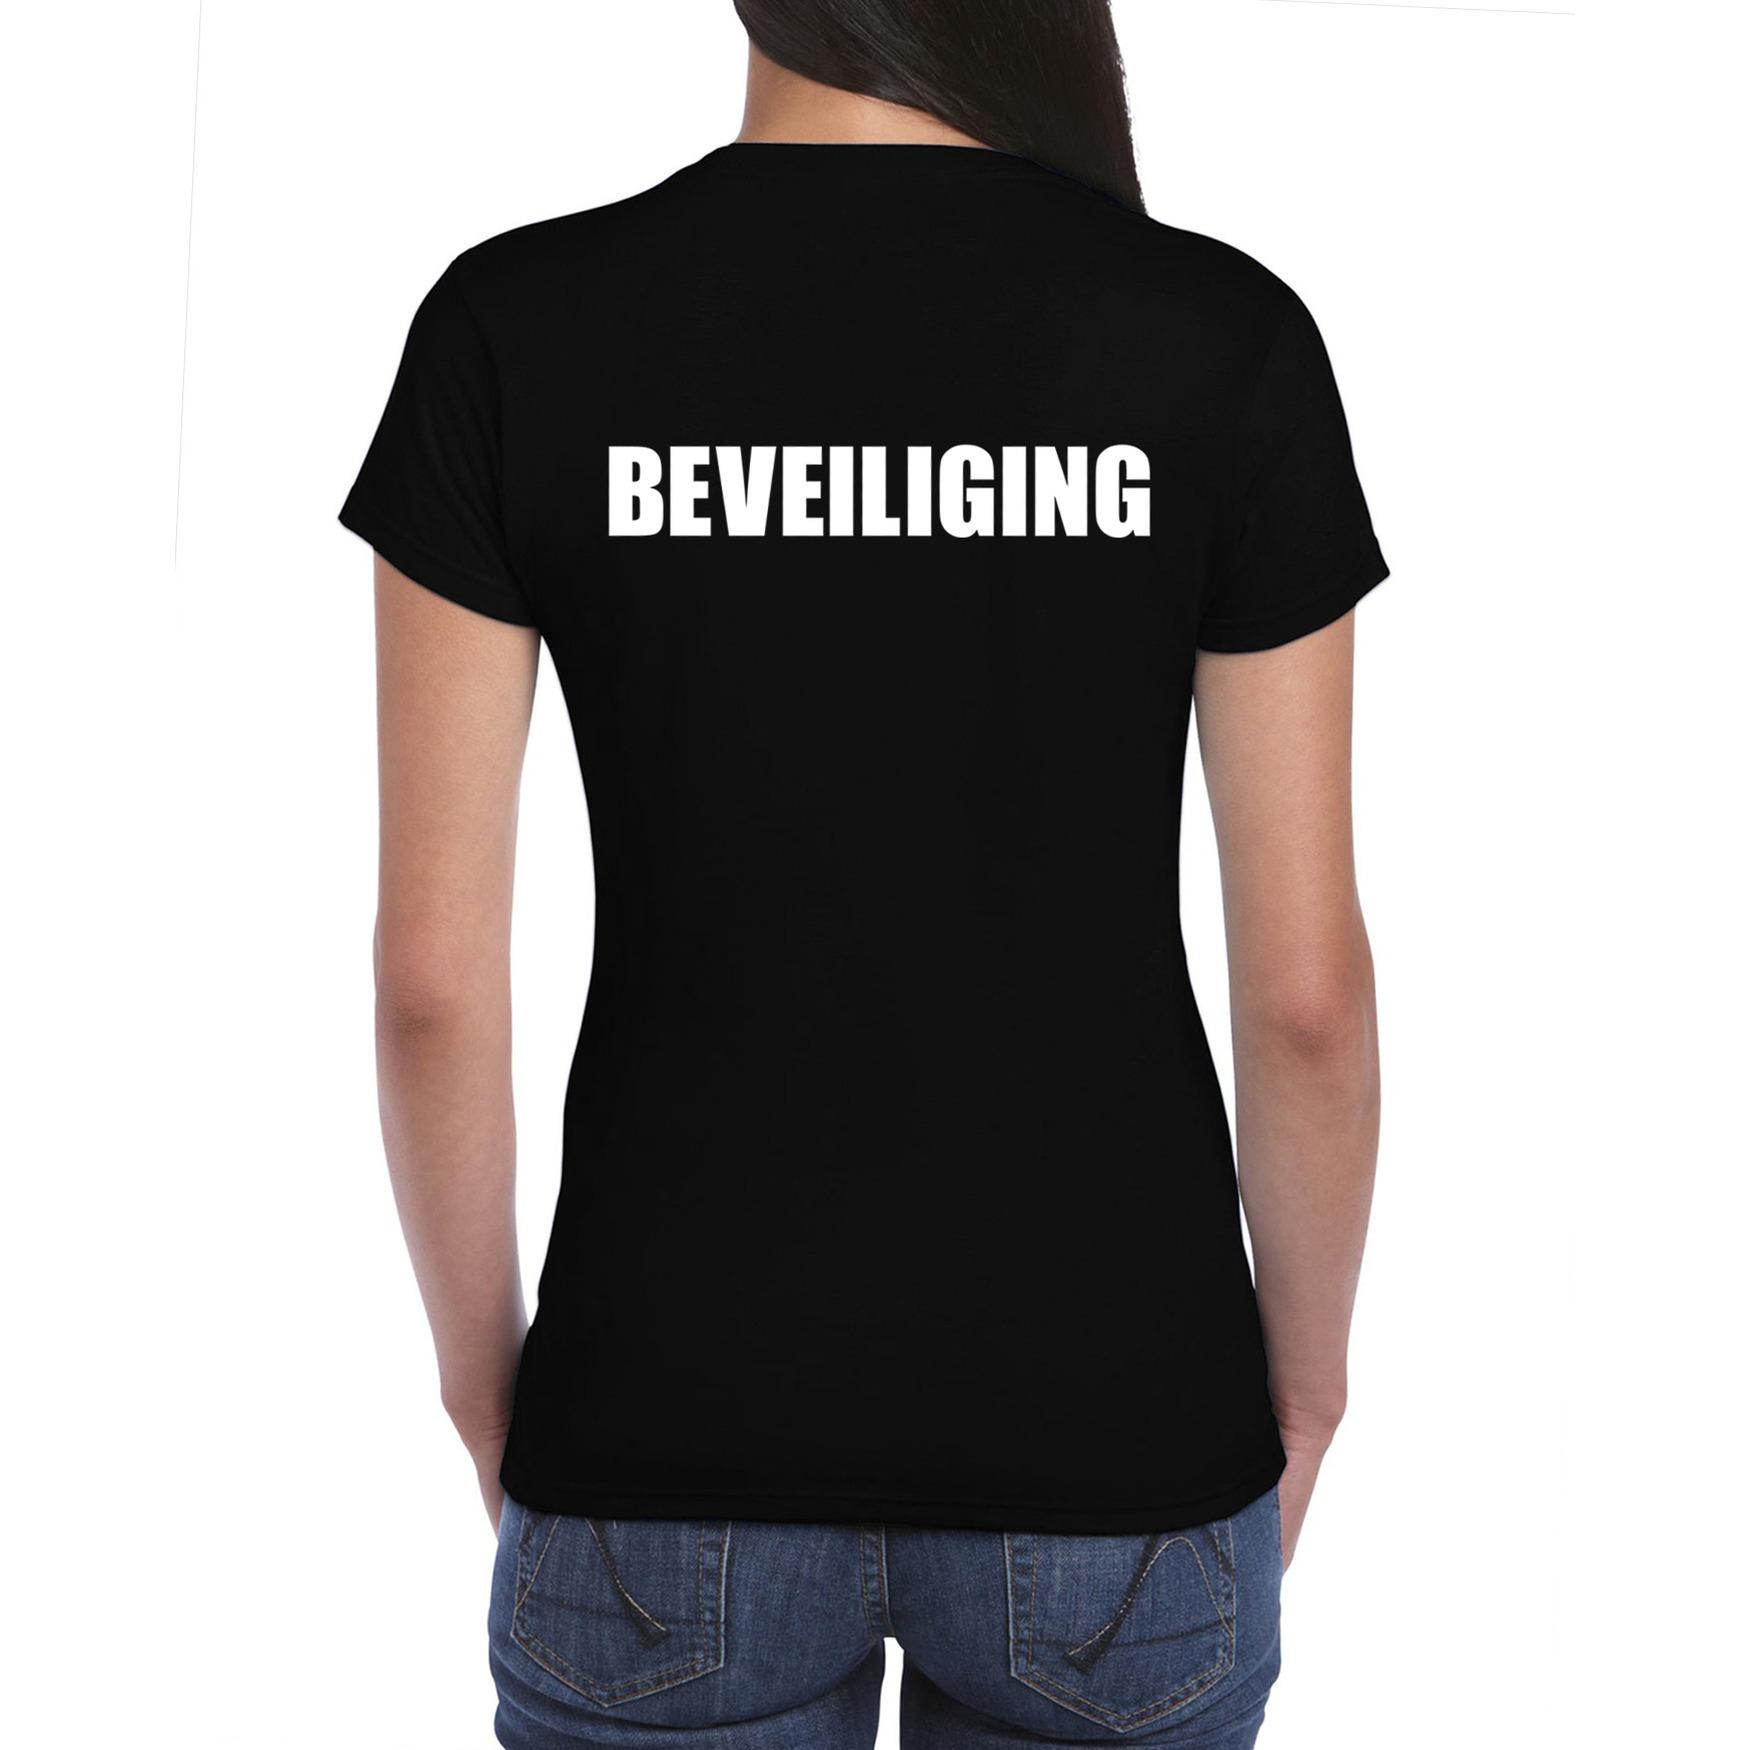 Beveiliging tekst t-shirt zwart dames